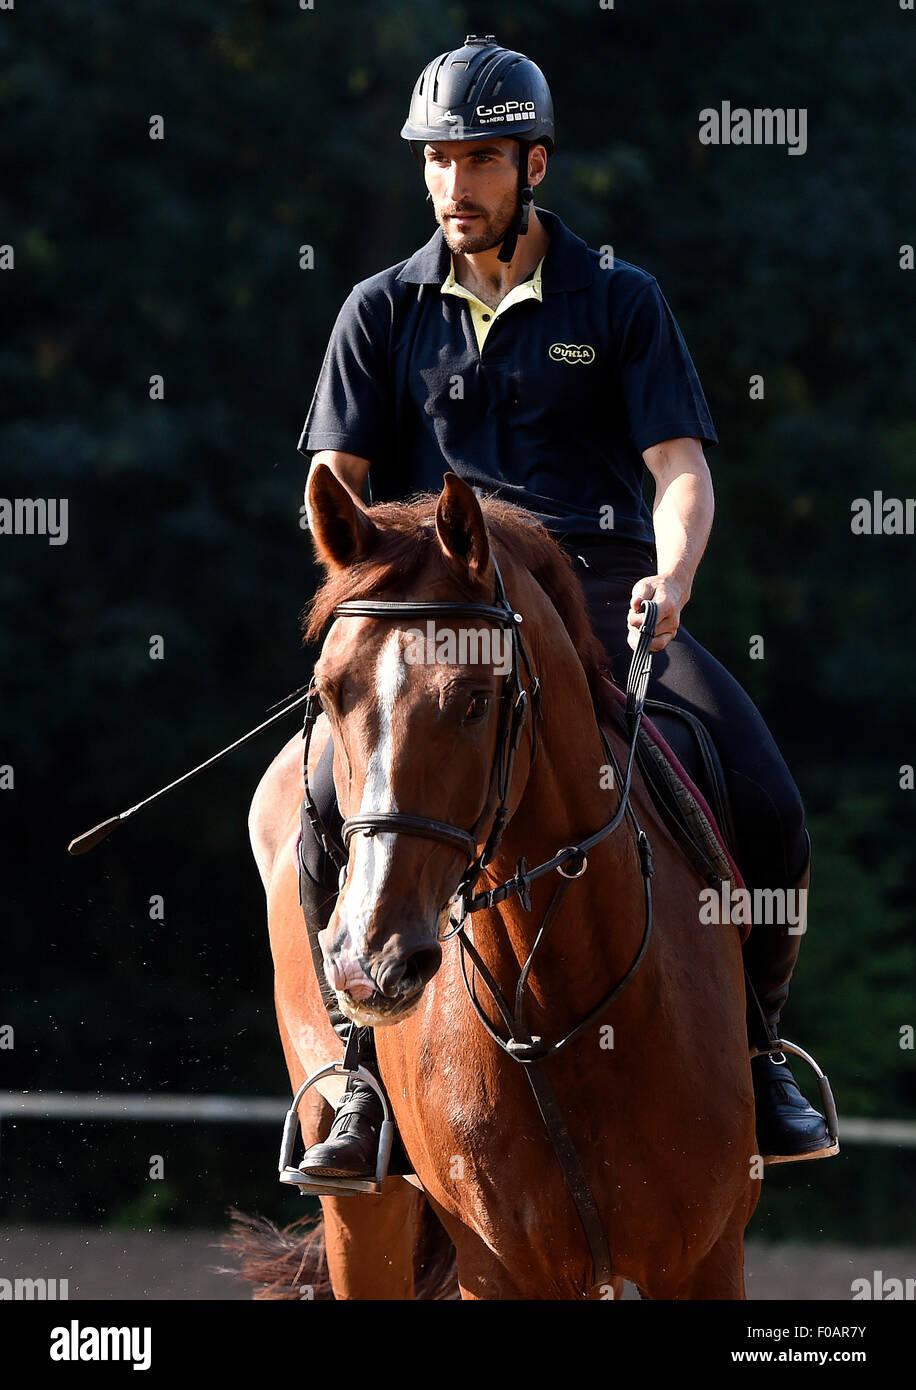 Czech athlete David Svoboda rides a horse at the meeting with Czech representatives of the modern pentathlon prior - Stock Image